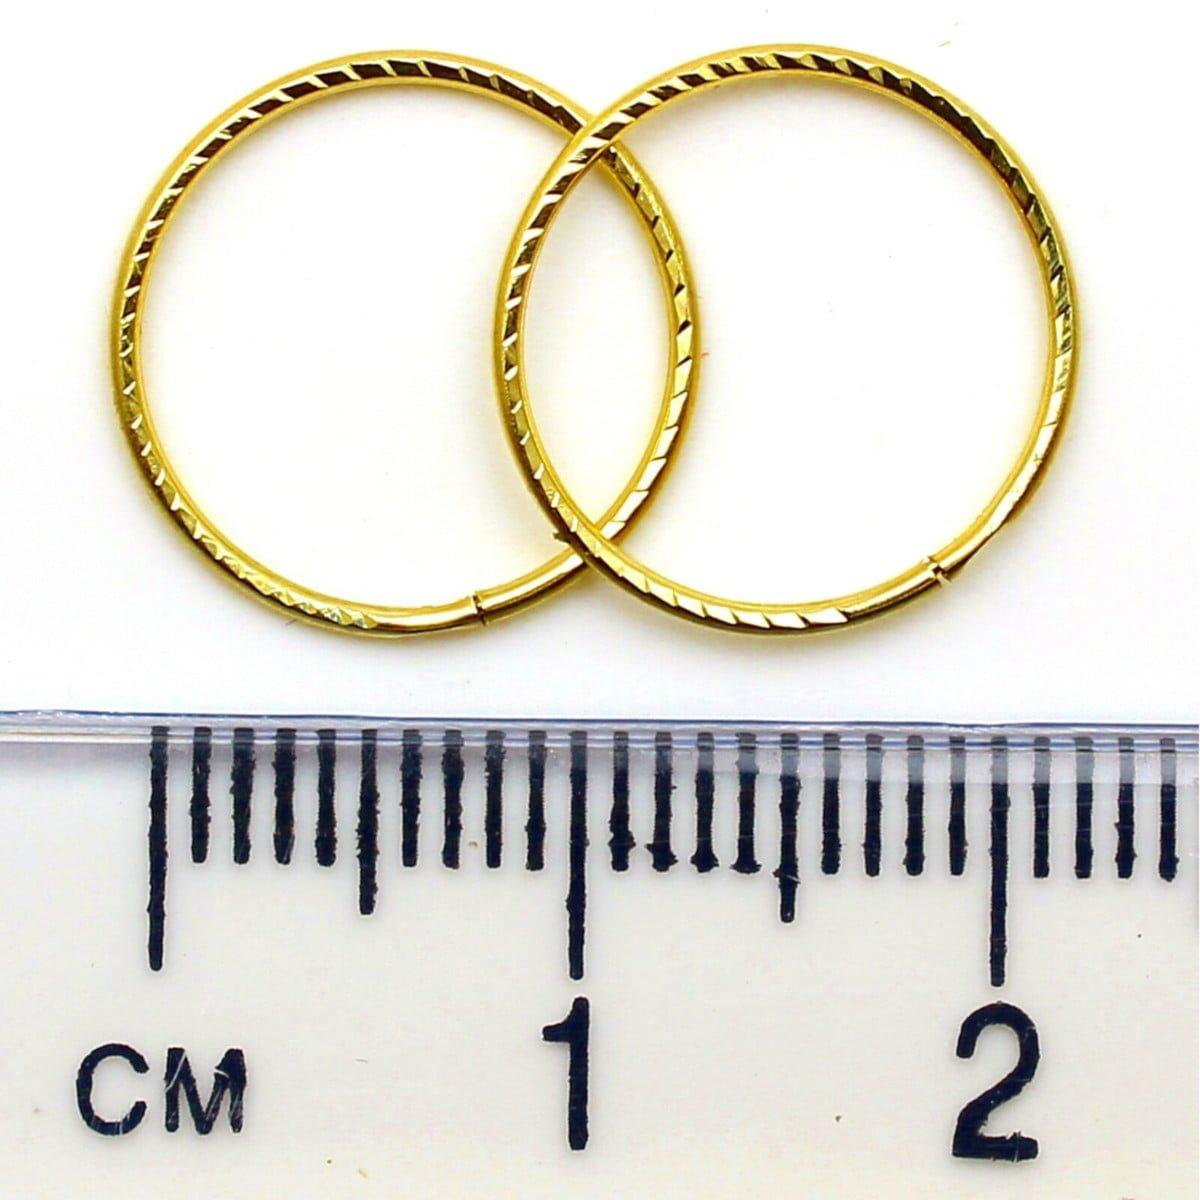 14 mm diamond cut sleeper hoops (1 pair) in 9ct yellow gold 1